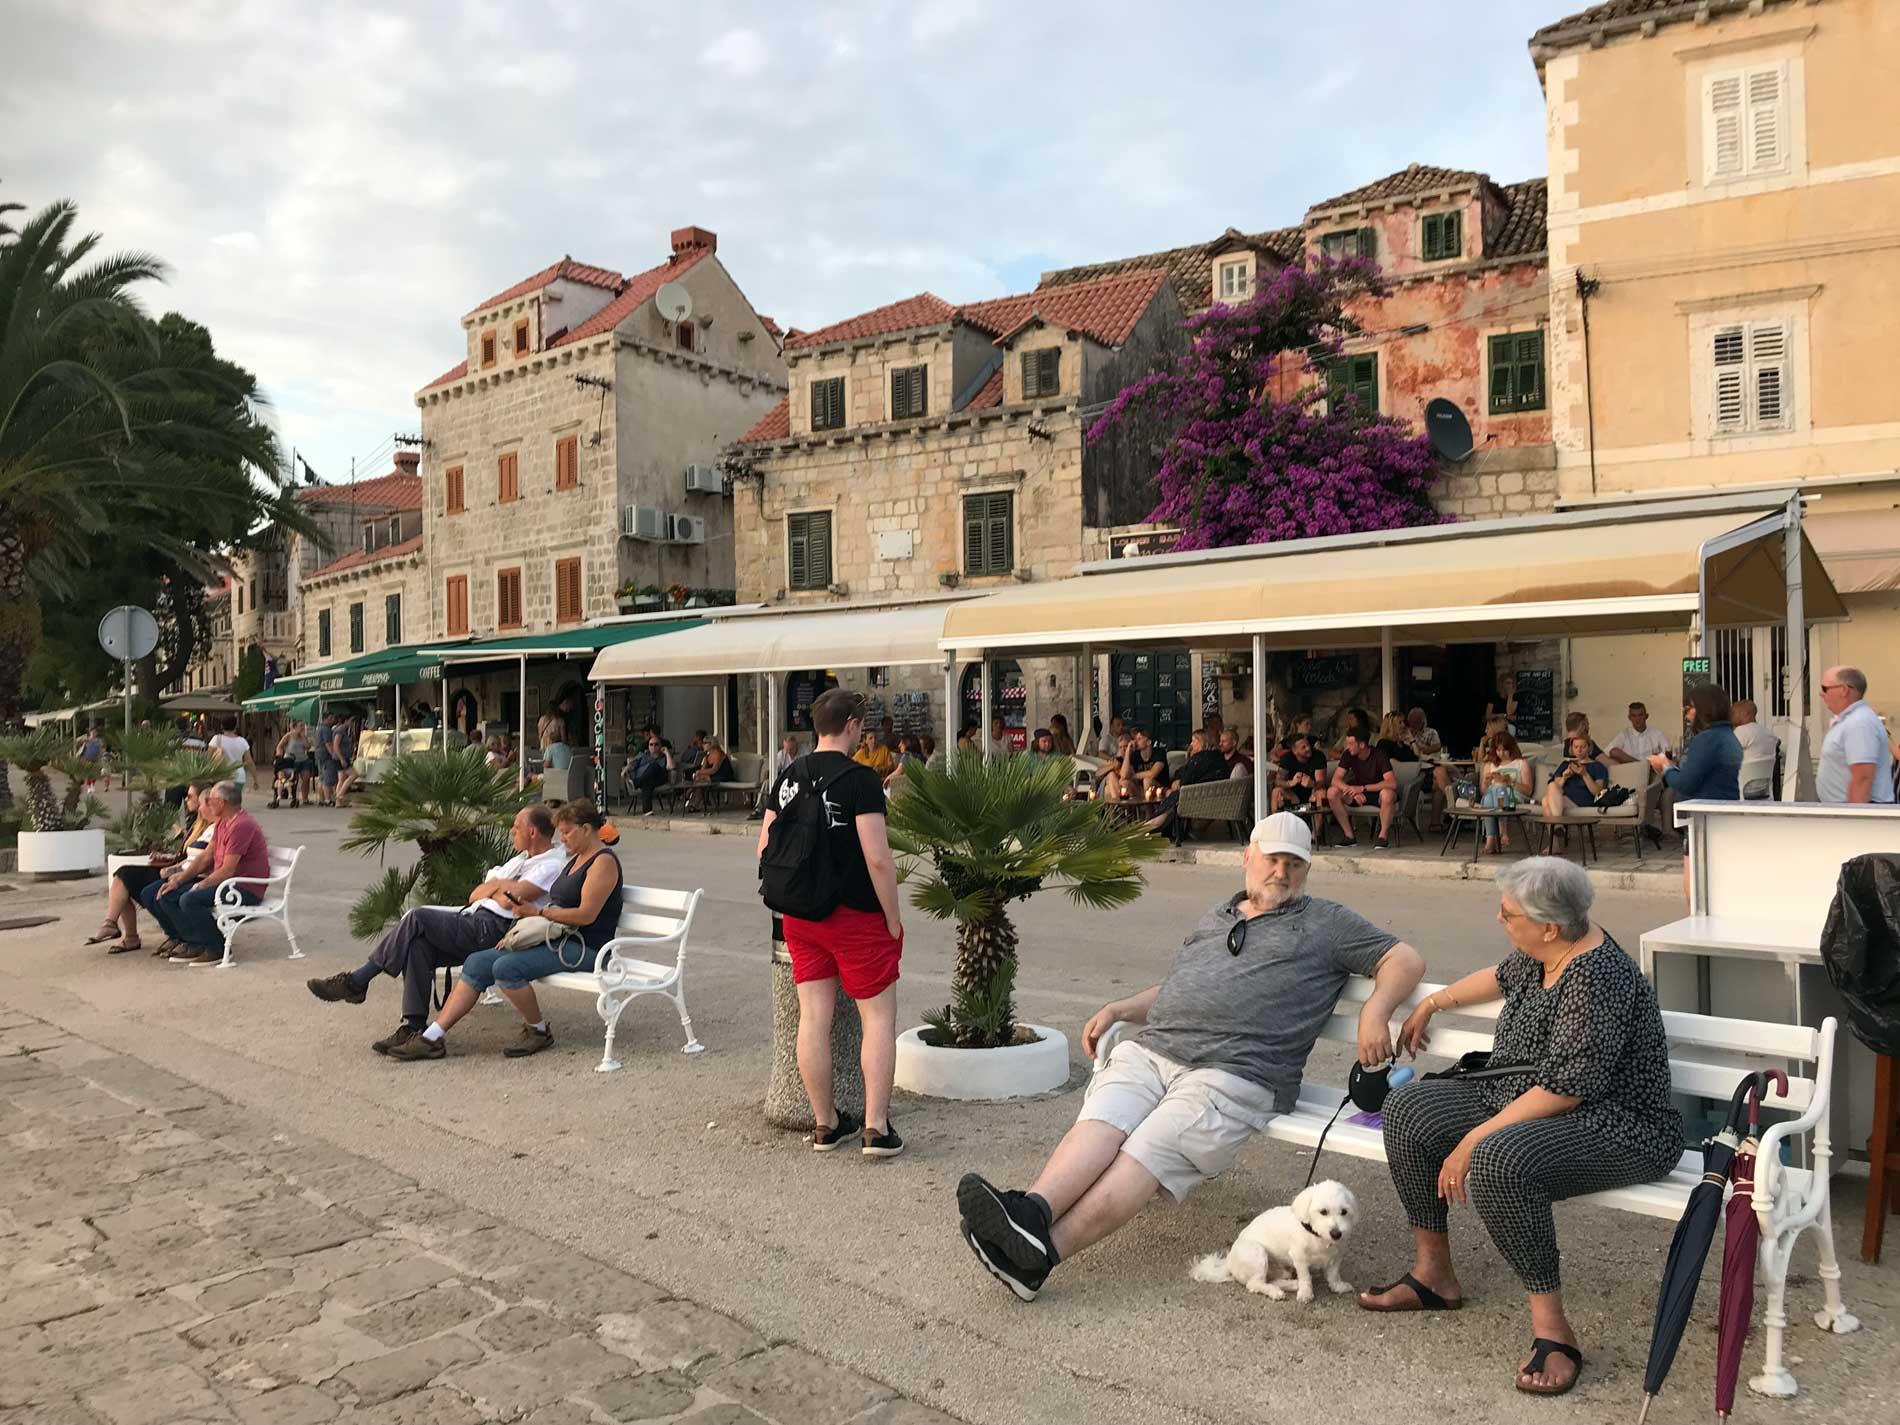 Cavtat-Dubrovnik-Croazia-persone-sedute-sulle-panchine